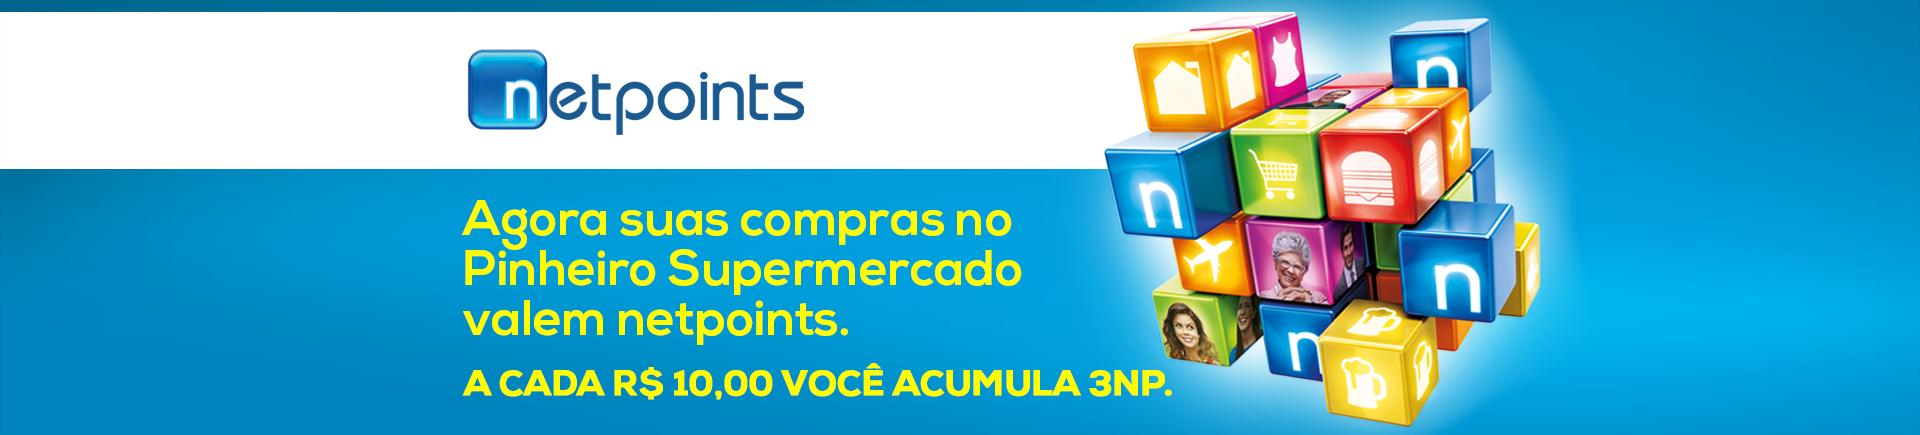 Netpoints